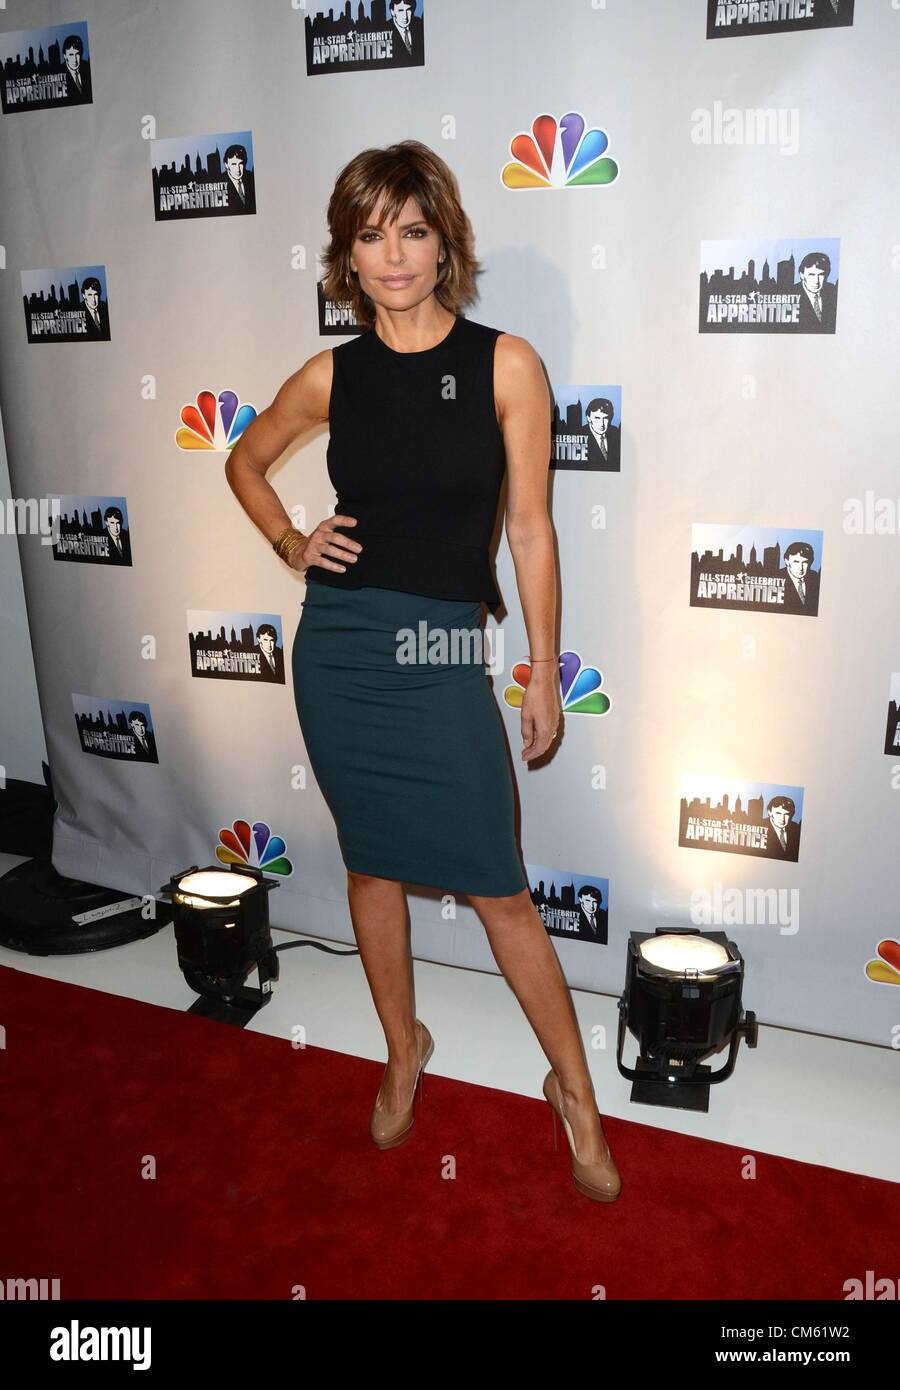 ed0eba7e1067 Lisa Rinna in attendance for All-Star Celebrity Apprentice Announces New  Cast